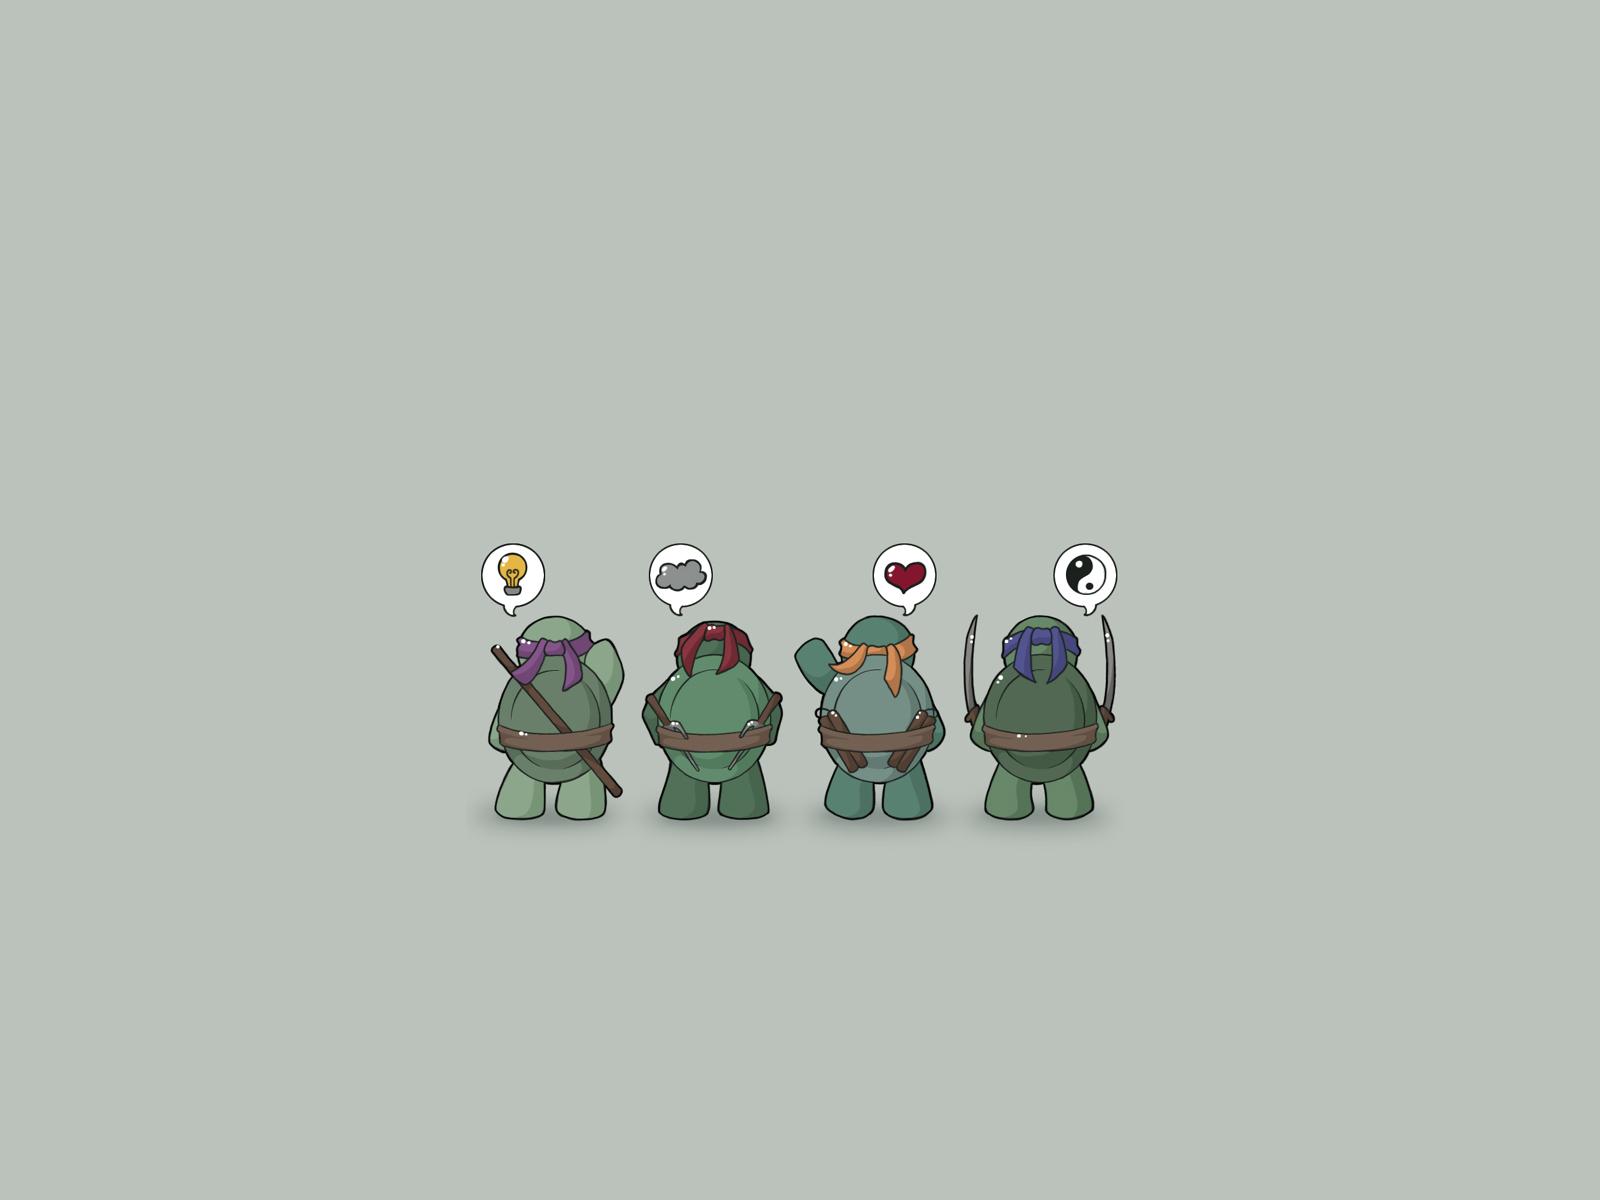 Комиксы - Черепашки-ниндзя  Обои